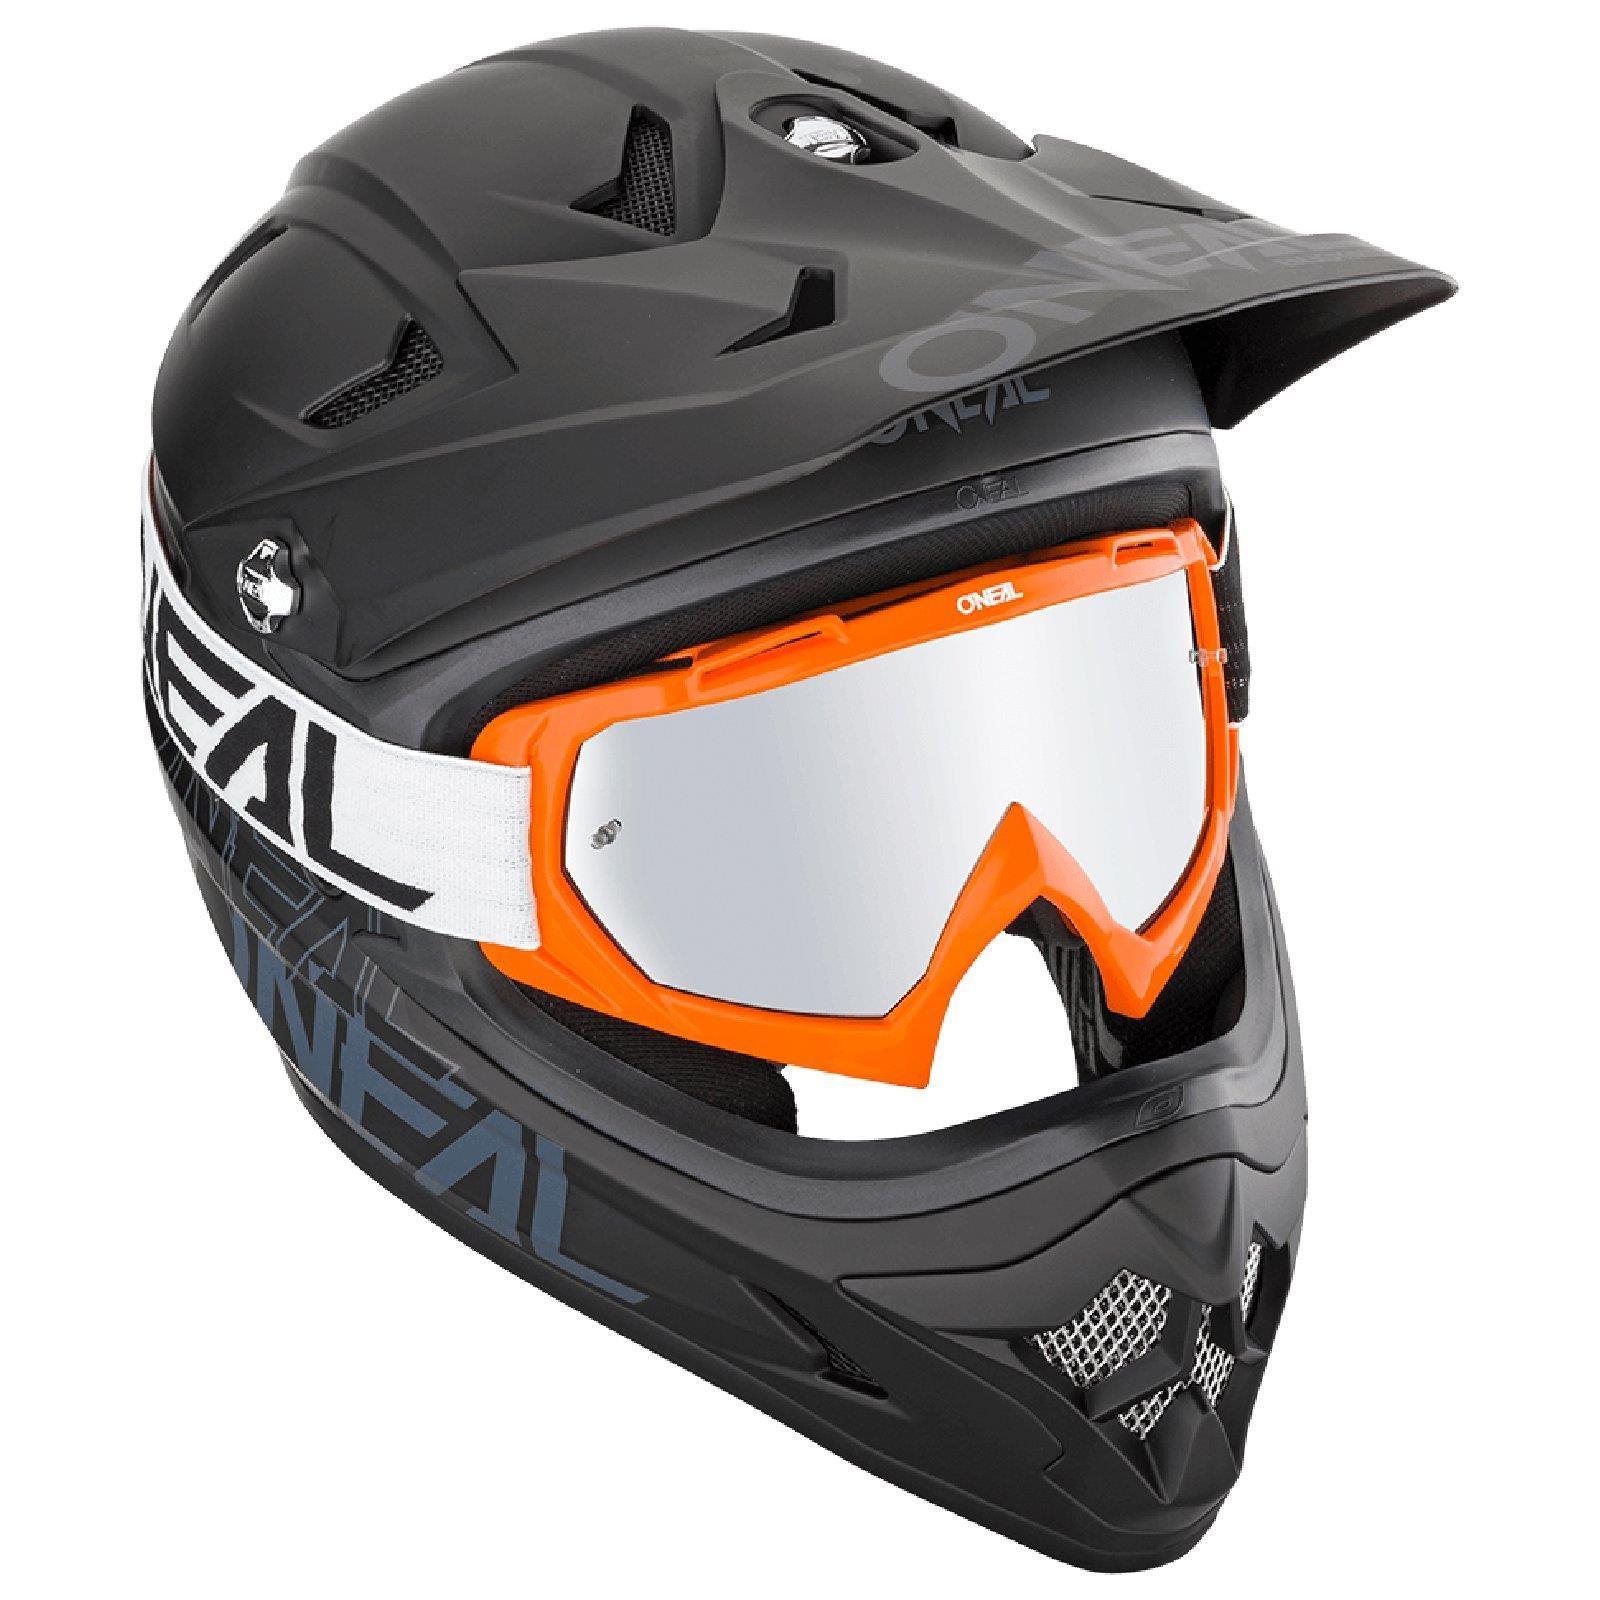 miniatuur 9 - O'Neal B-10 Goggle Twoface MX Brille Verspiegelt Silber Moto Cross Downhill MTB